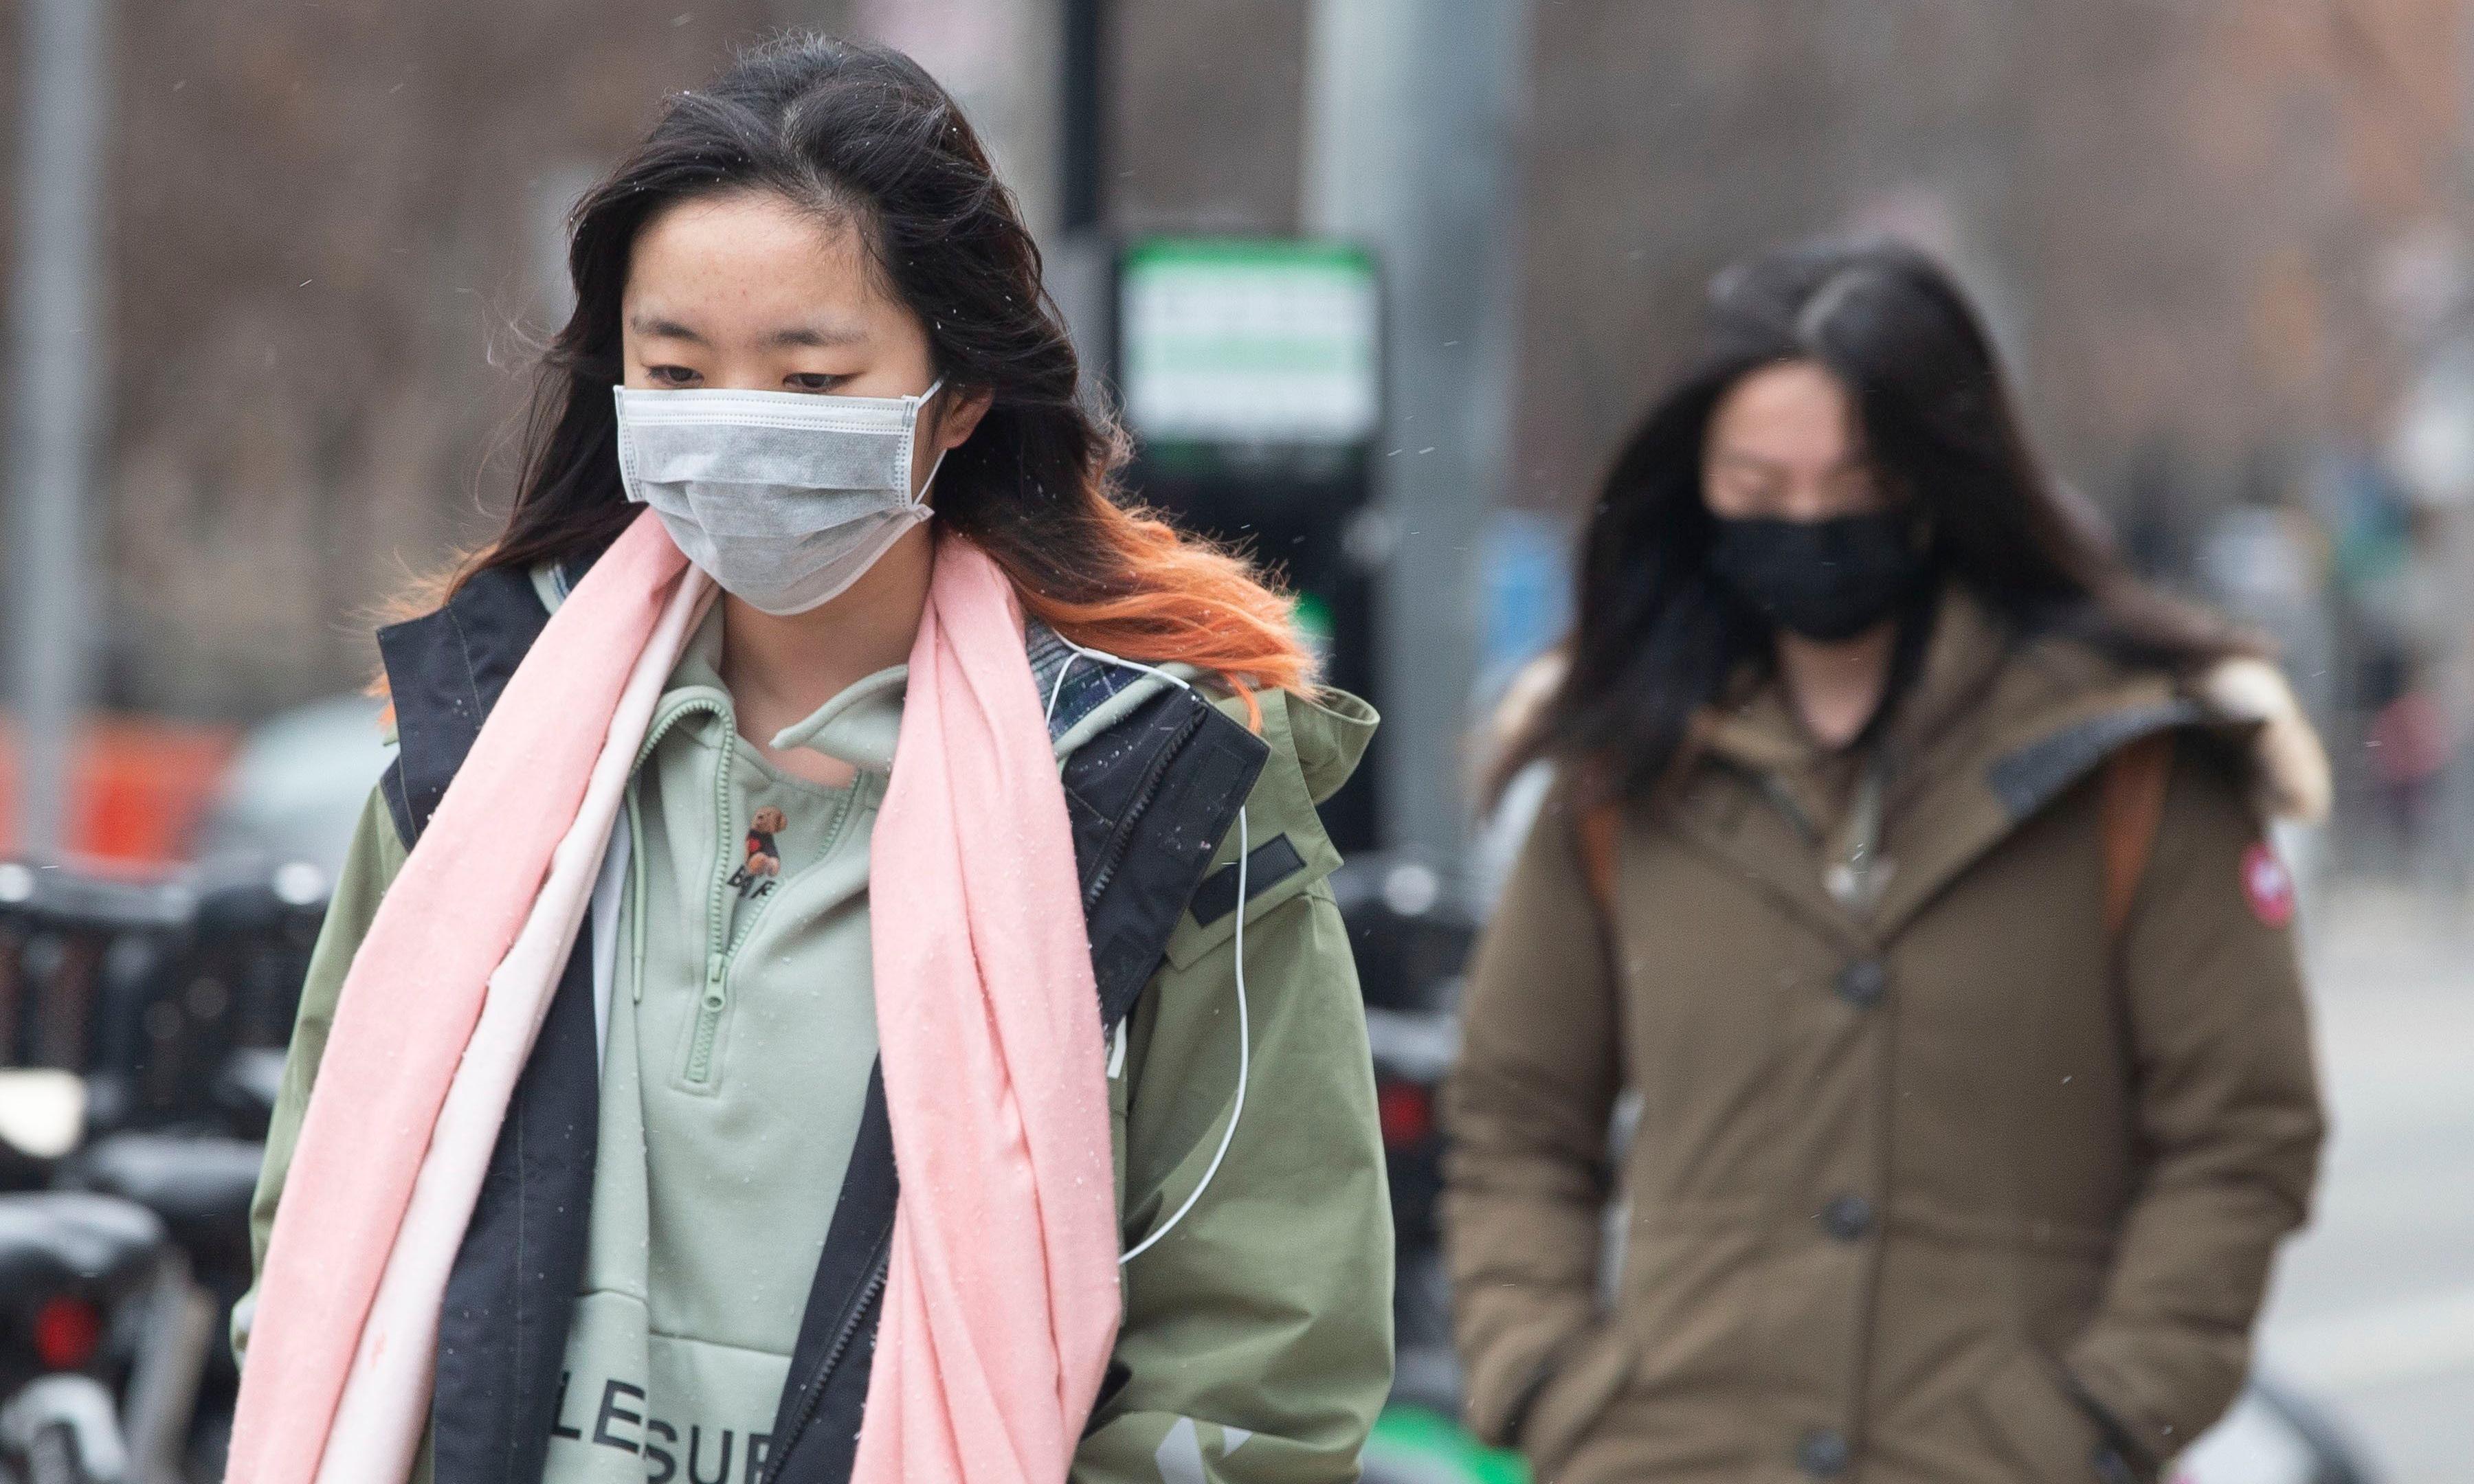 Canada's Chinese community faces racist abuse in wake of coronavirus